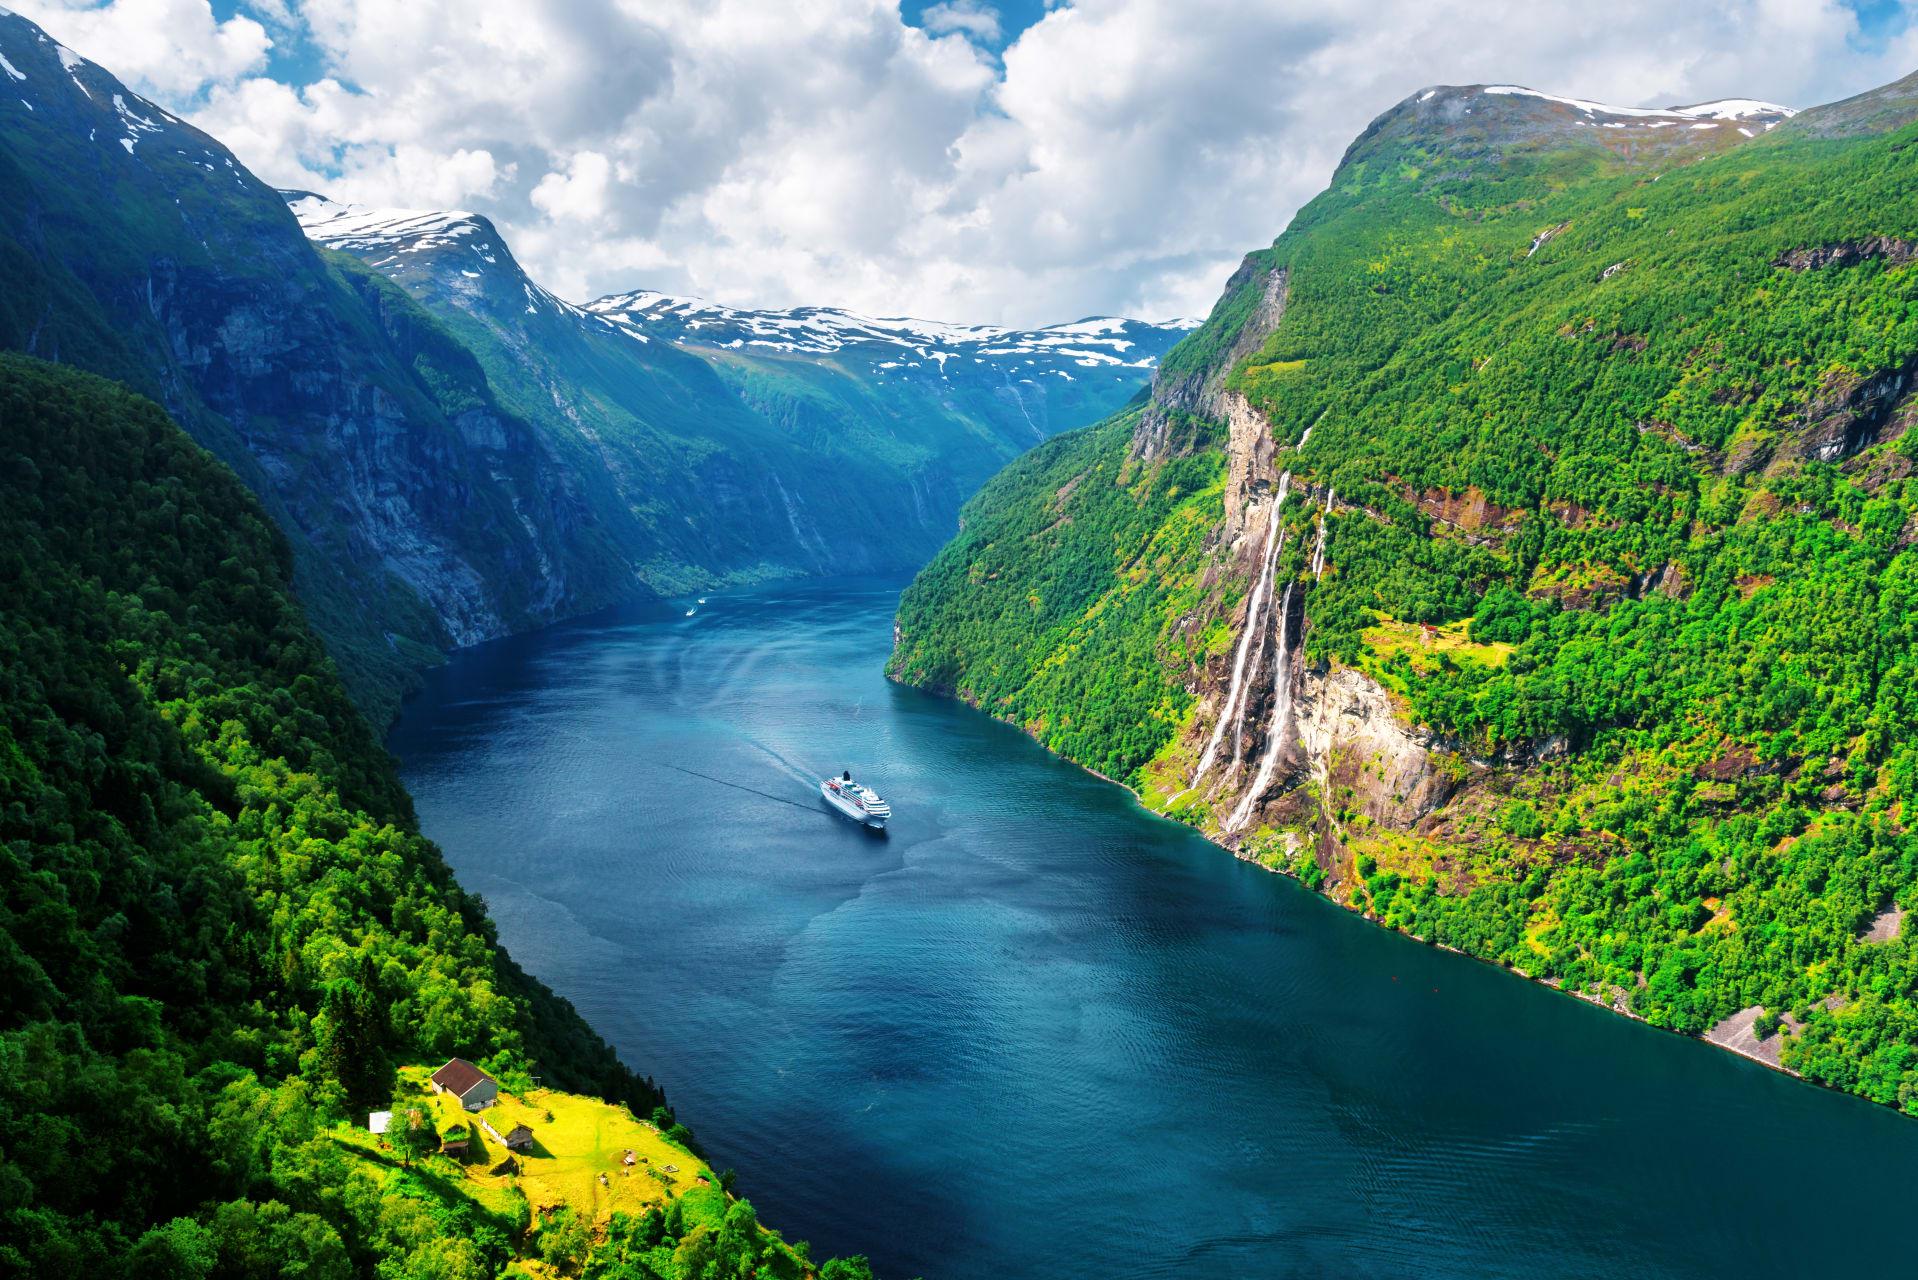 Bergen - Exploring the Fjords of Norway